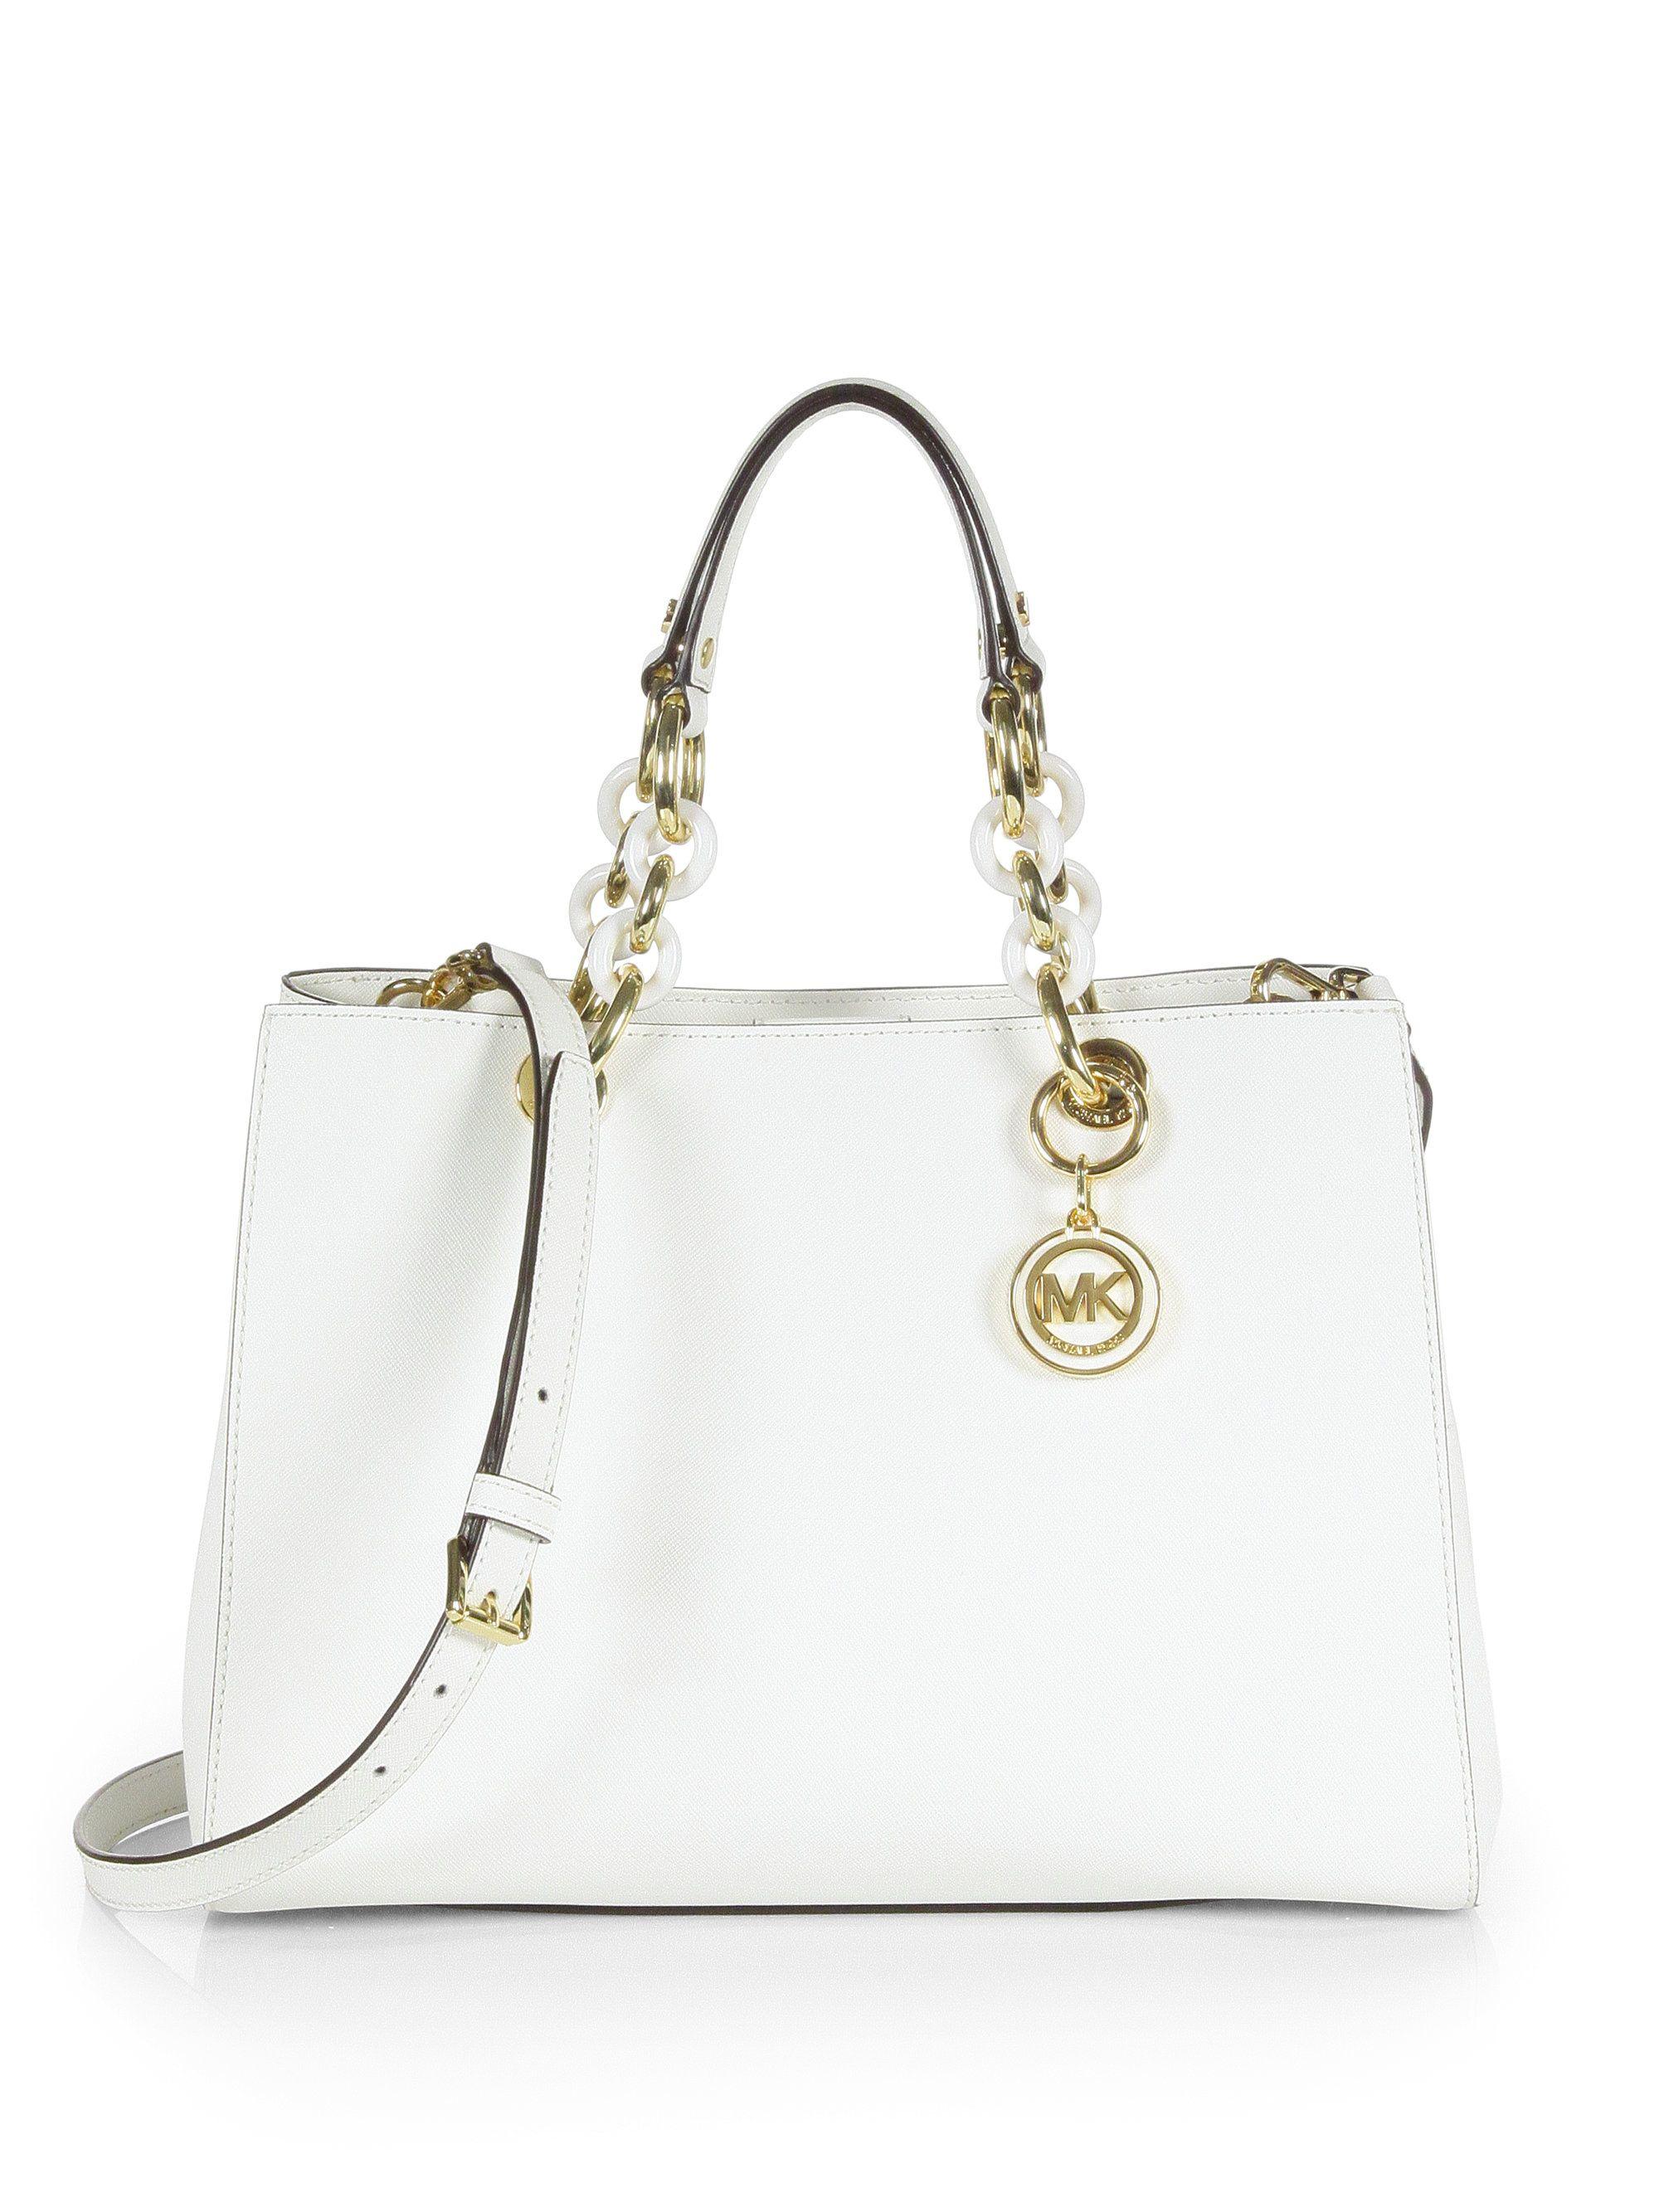 a61cf1697dda Women's Natural Cynthia Medium Satchel | Bag galore | Michael kors ...